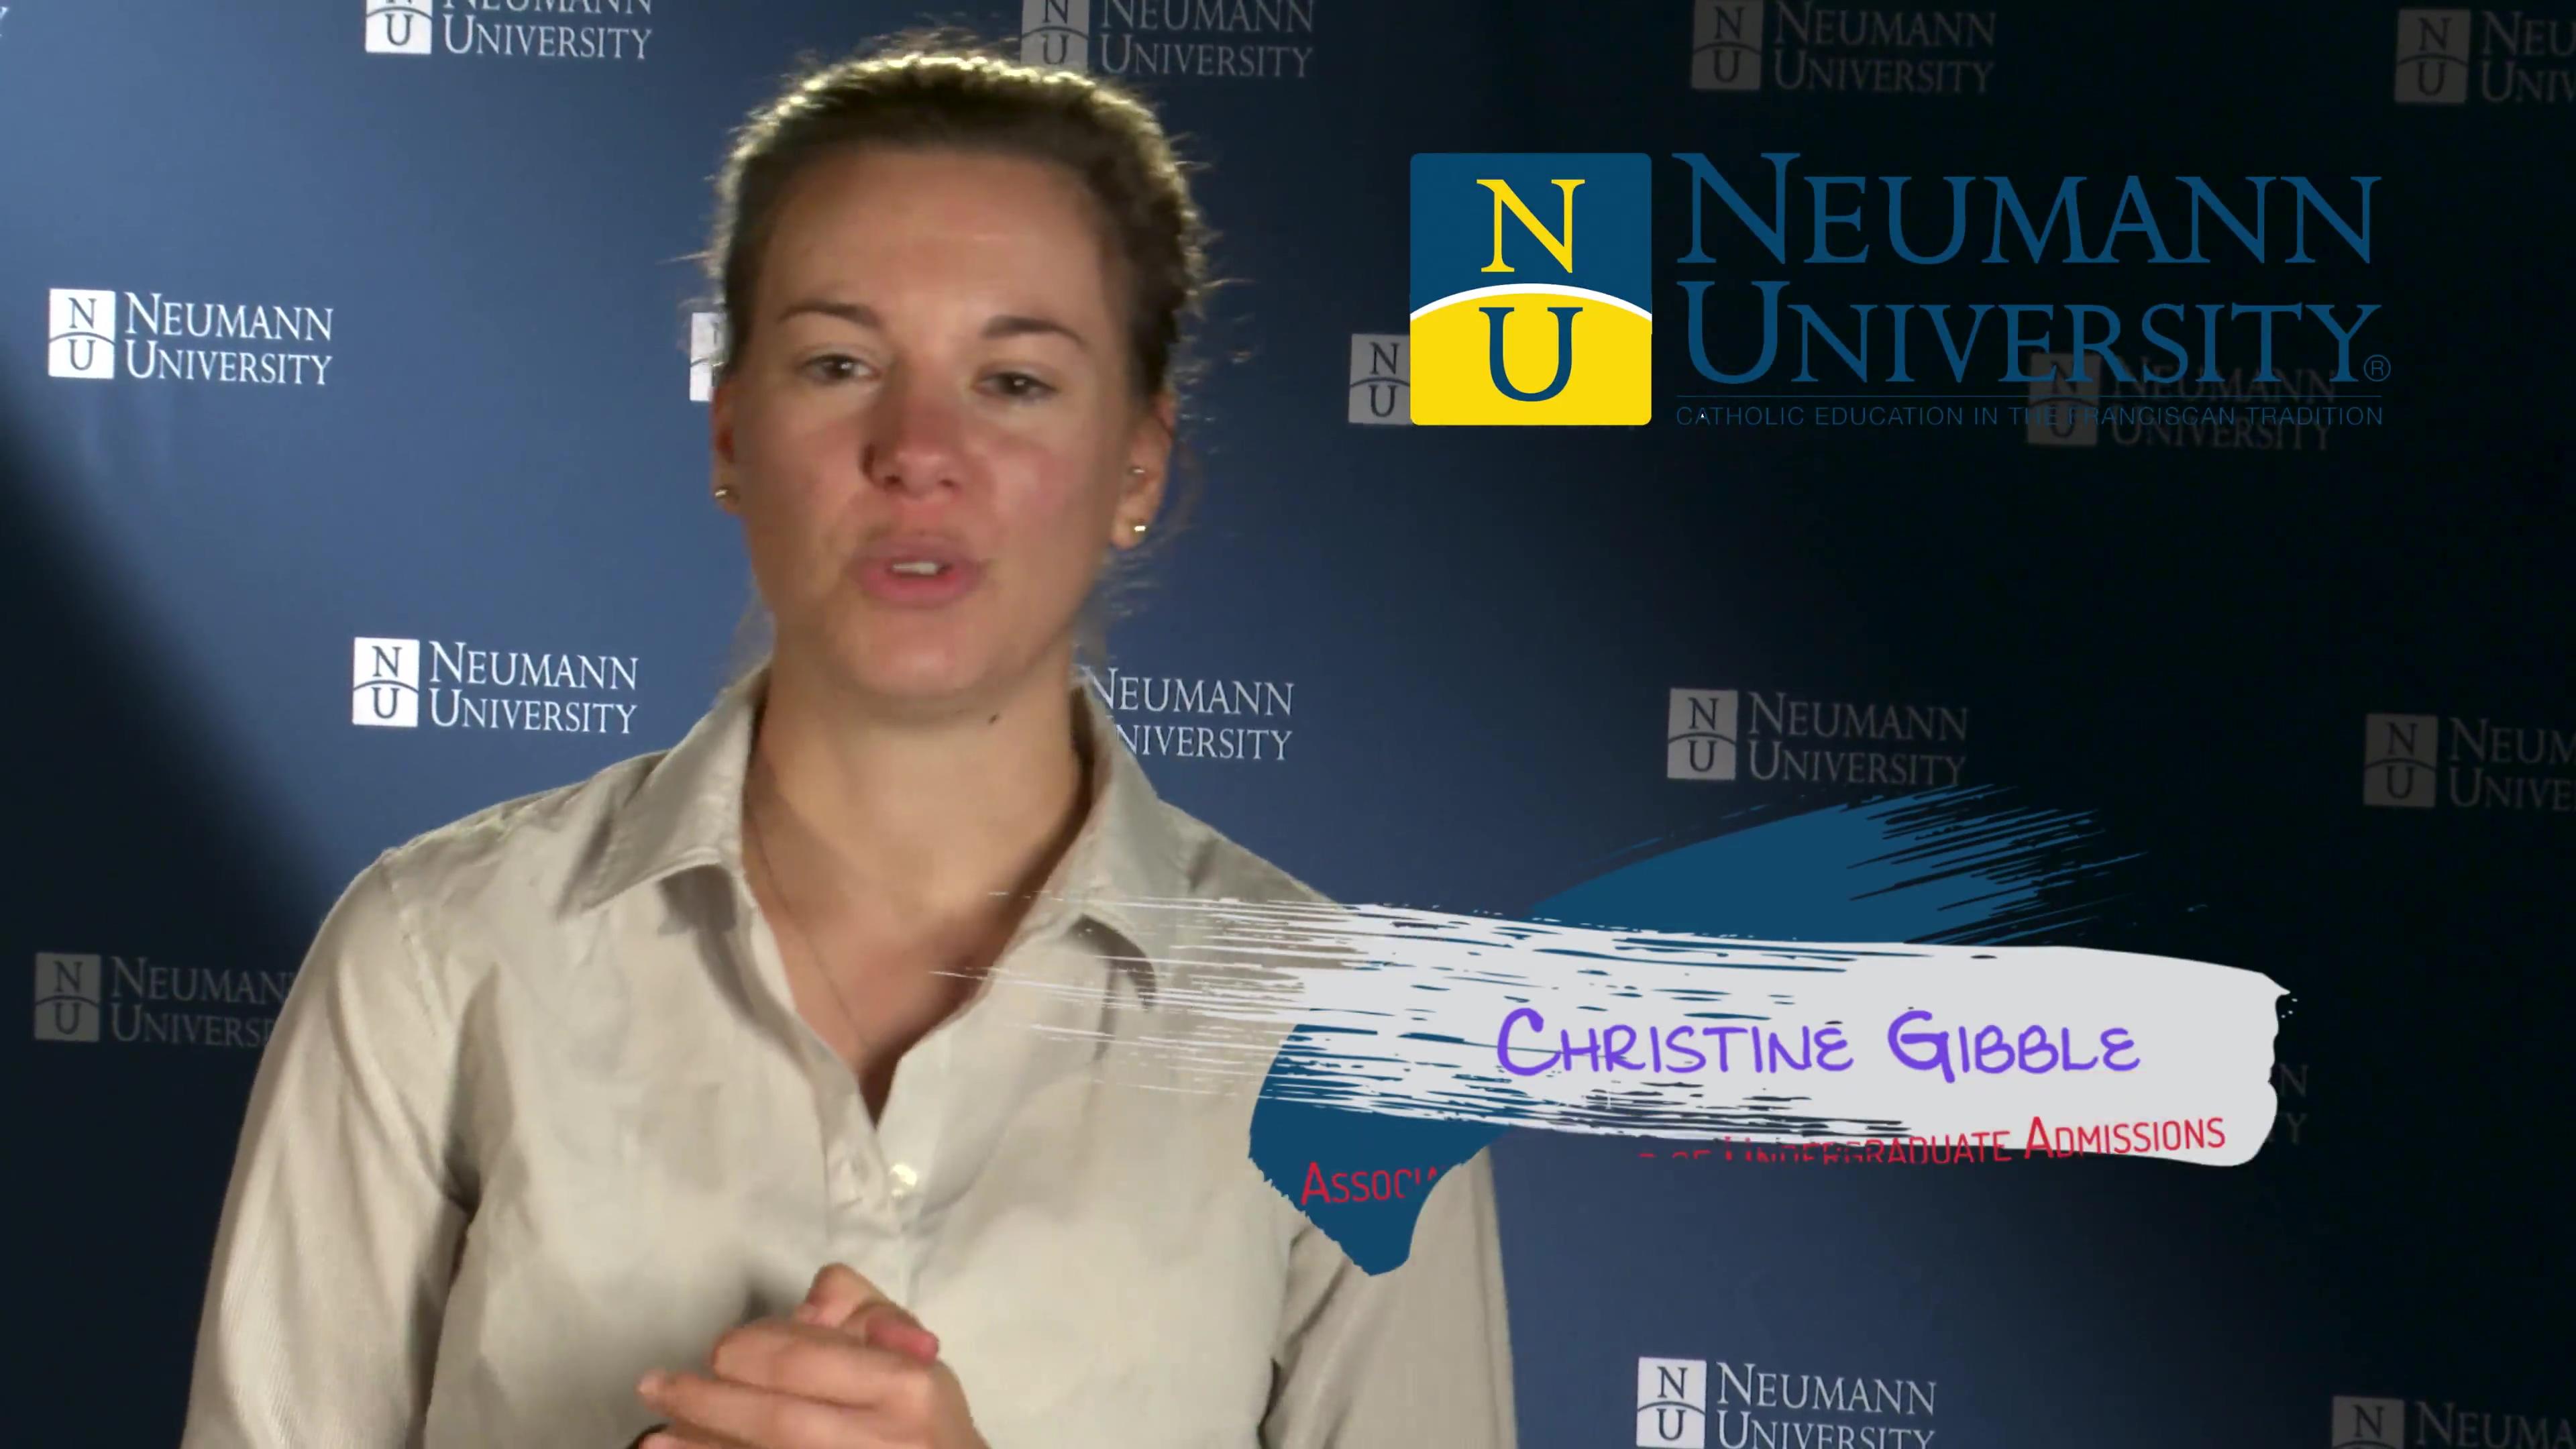 Neumann University - Associate Director of Undergraduate Admissions Christine Gibble